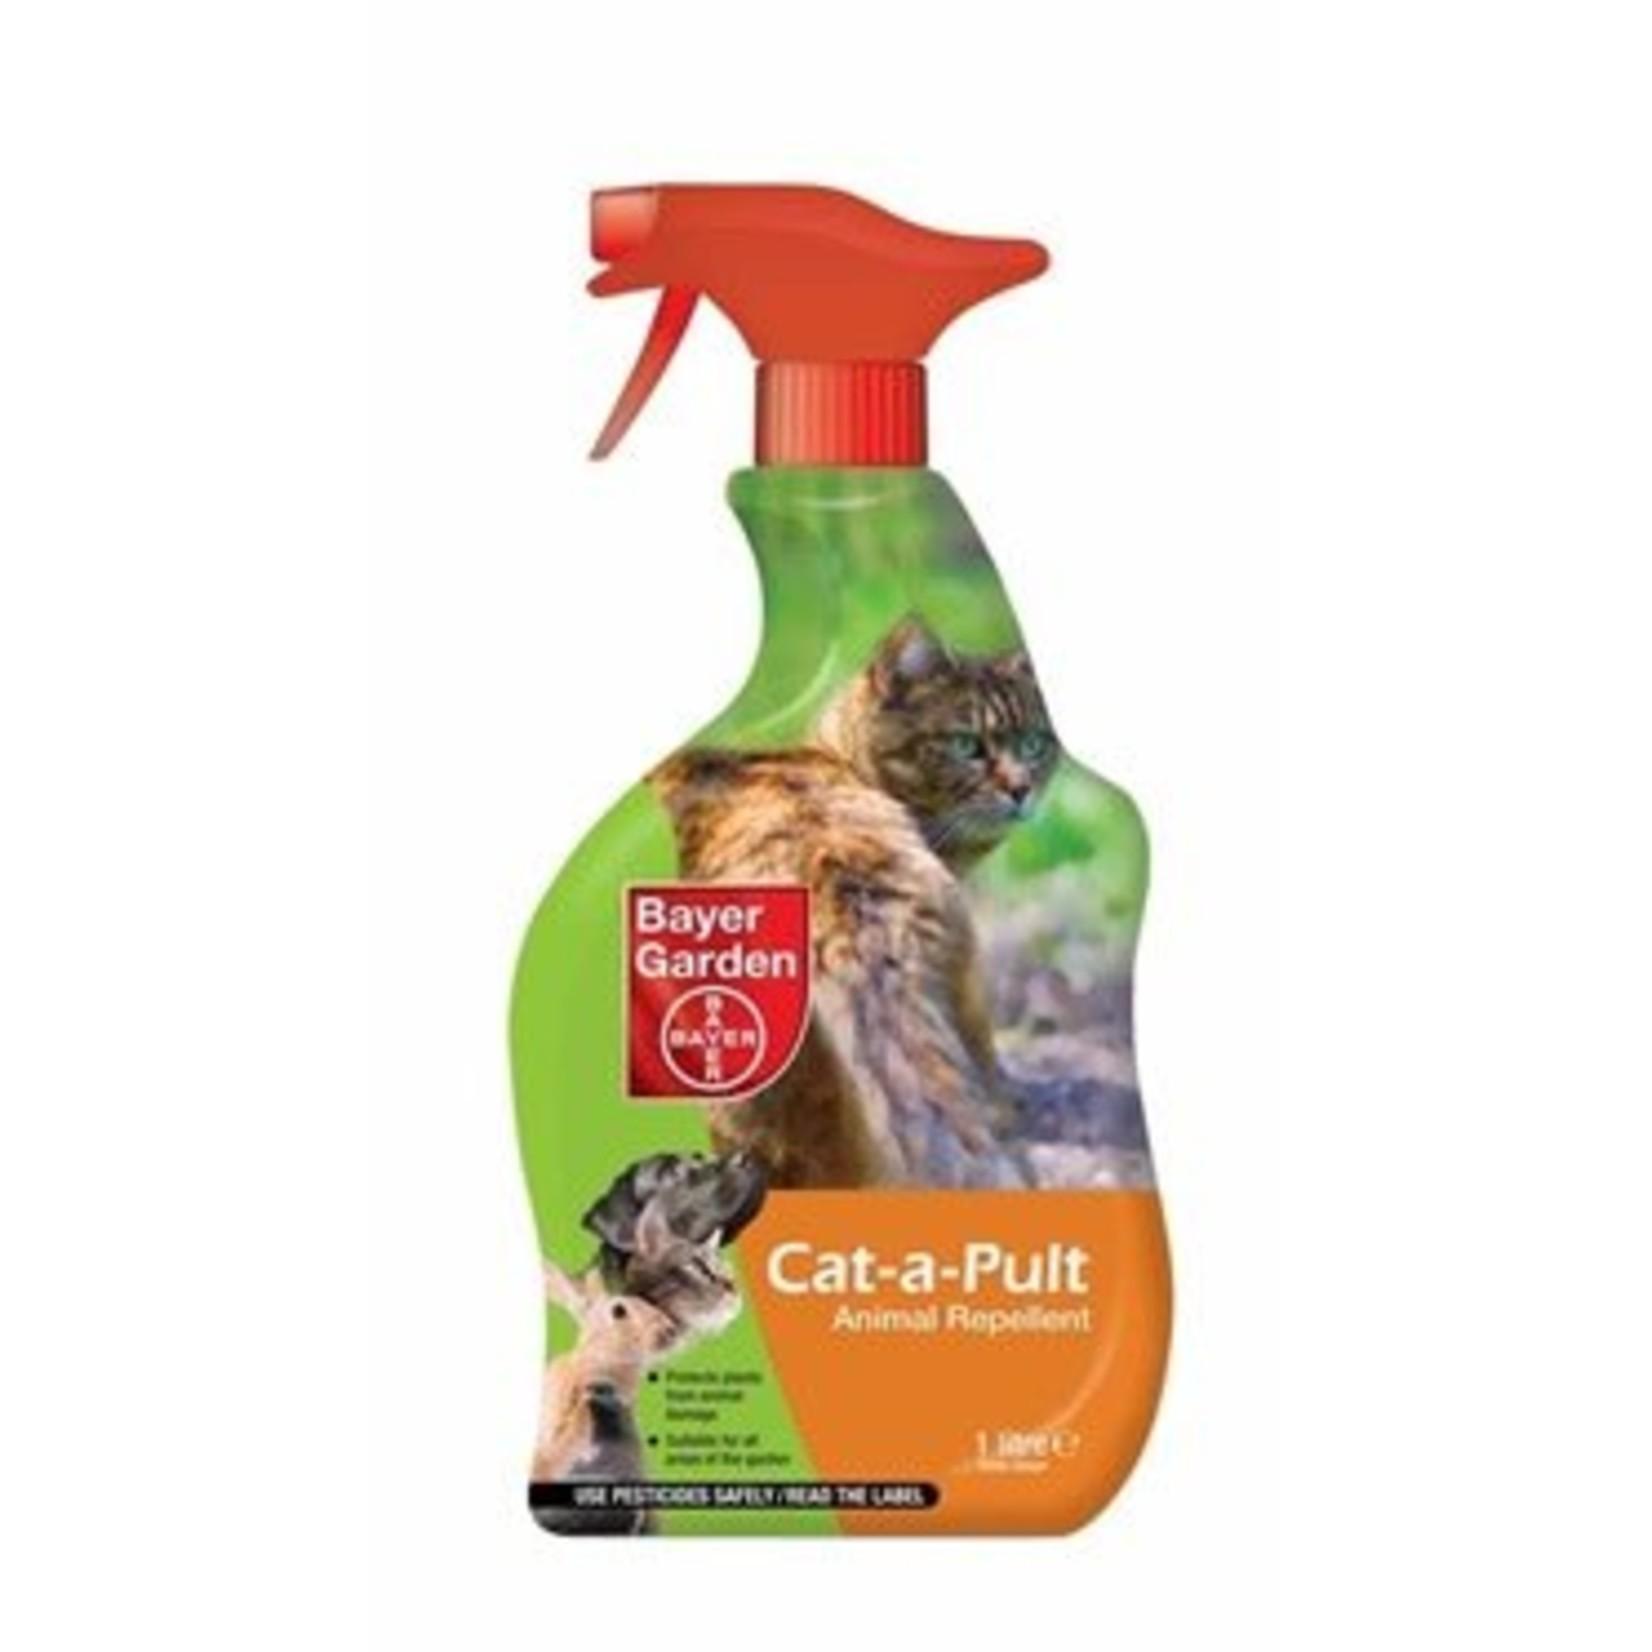 Bayer Garden BAYER GARDEN CAT-A-PULT ANIMAL REPELLENT 1L